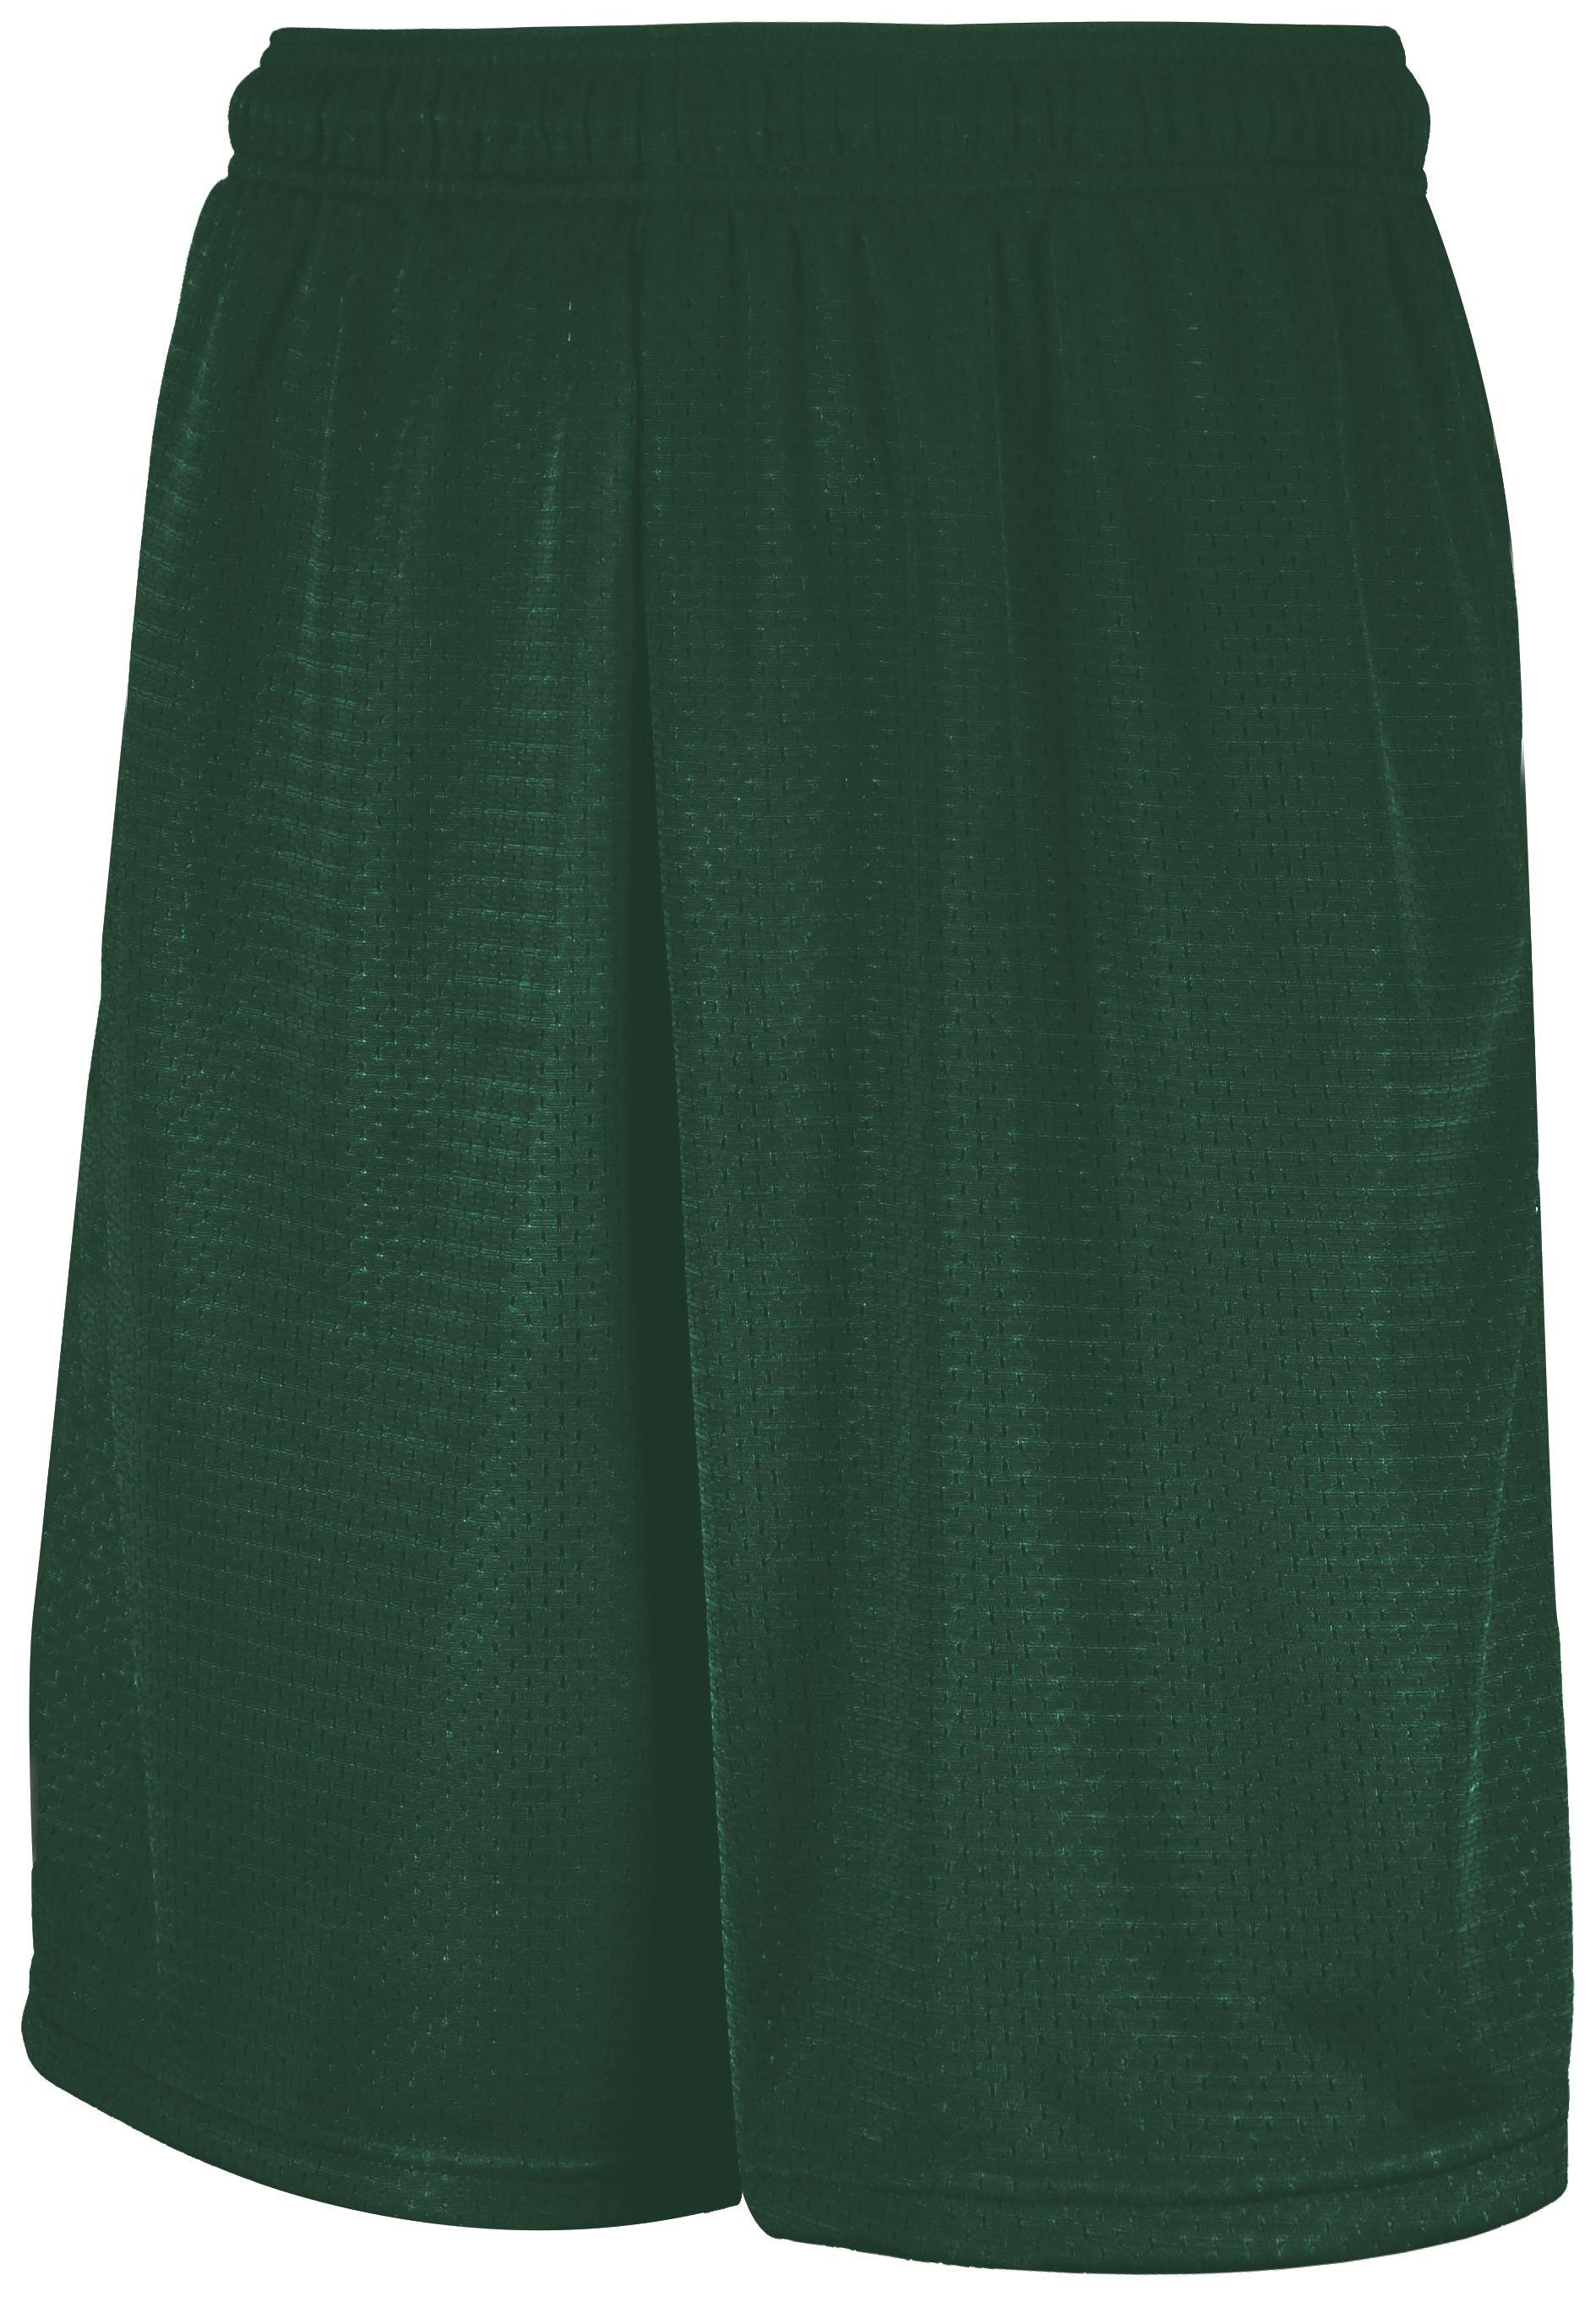 Mesh Shorts With Pockets - Dark Green